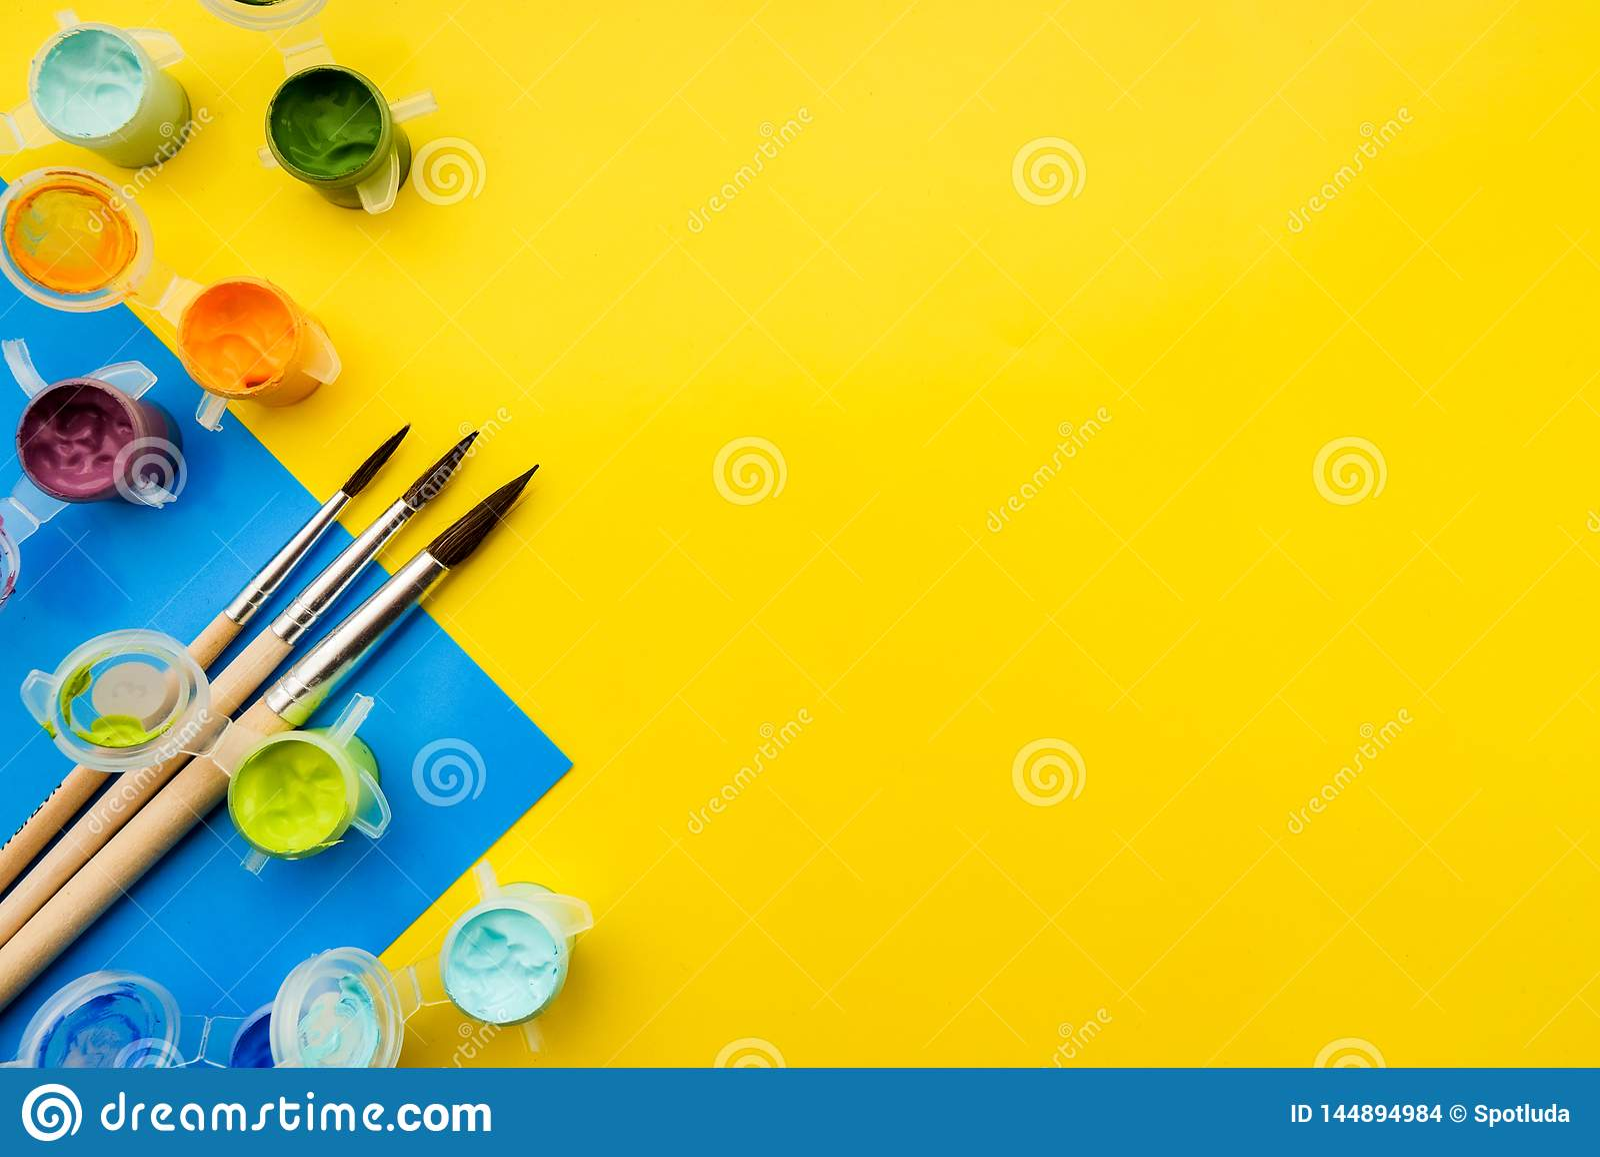 Vlak leg samenstelling met verschillende acryl of olieverven en borstels op grungeachtergrond